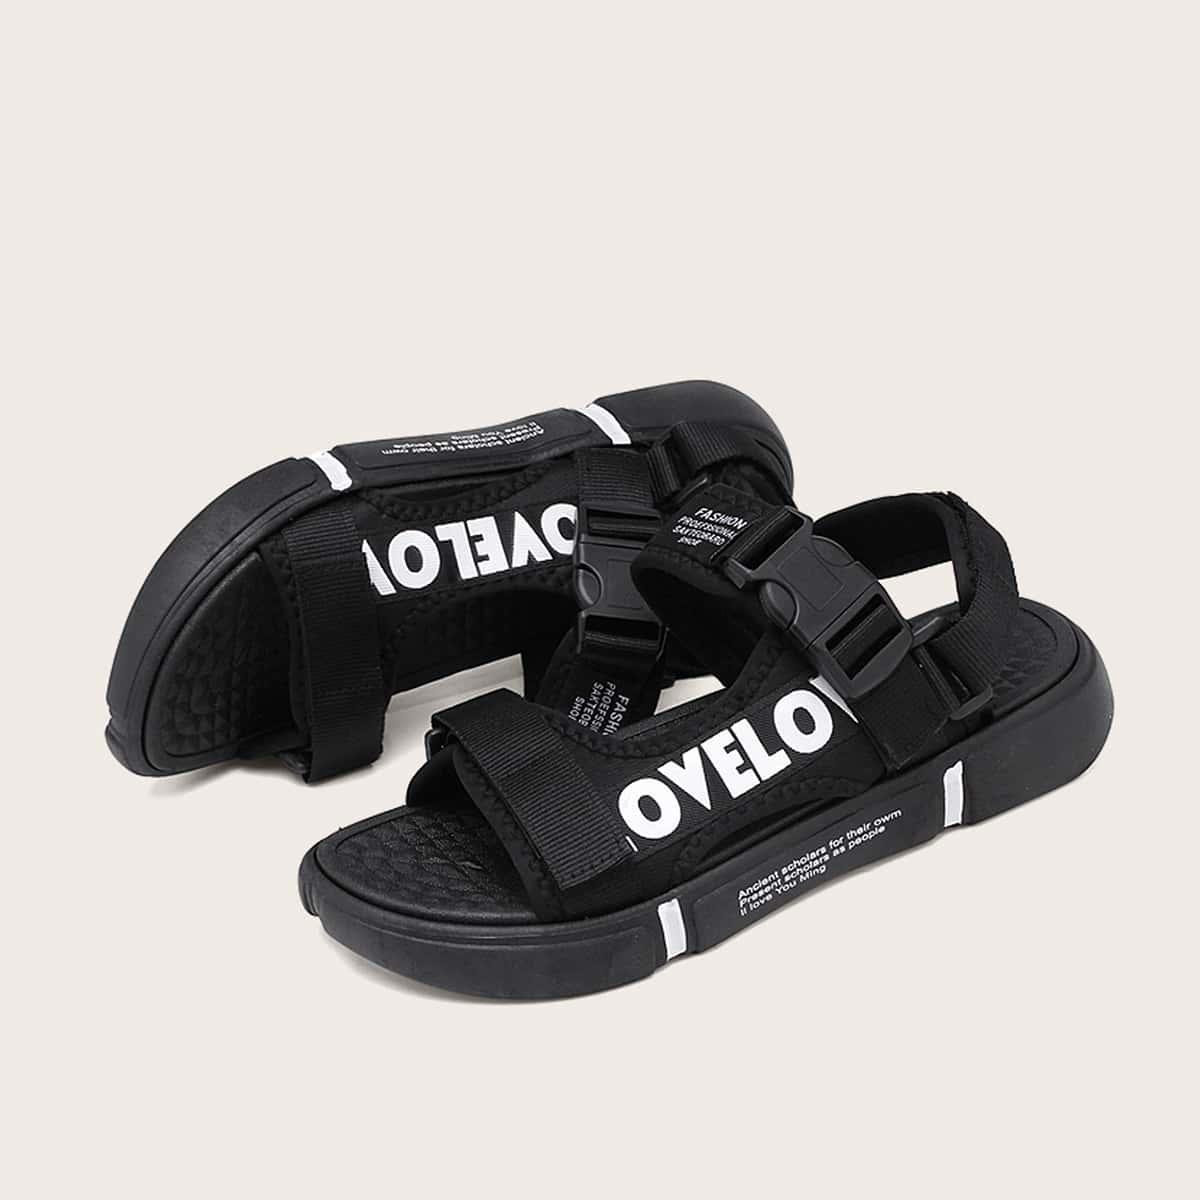 Mannen Letter grafische release gesp dikke sandalen